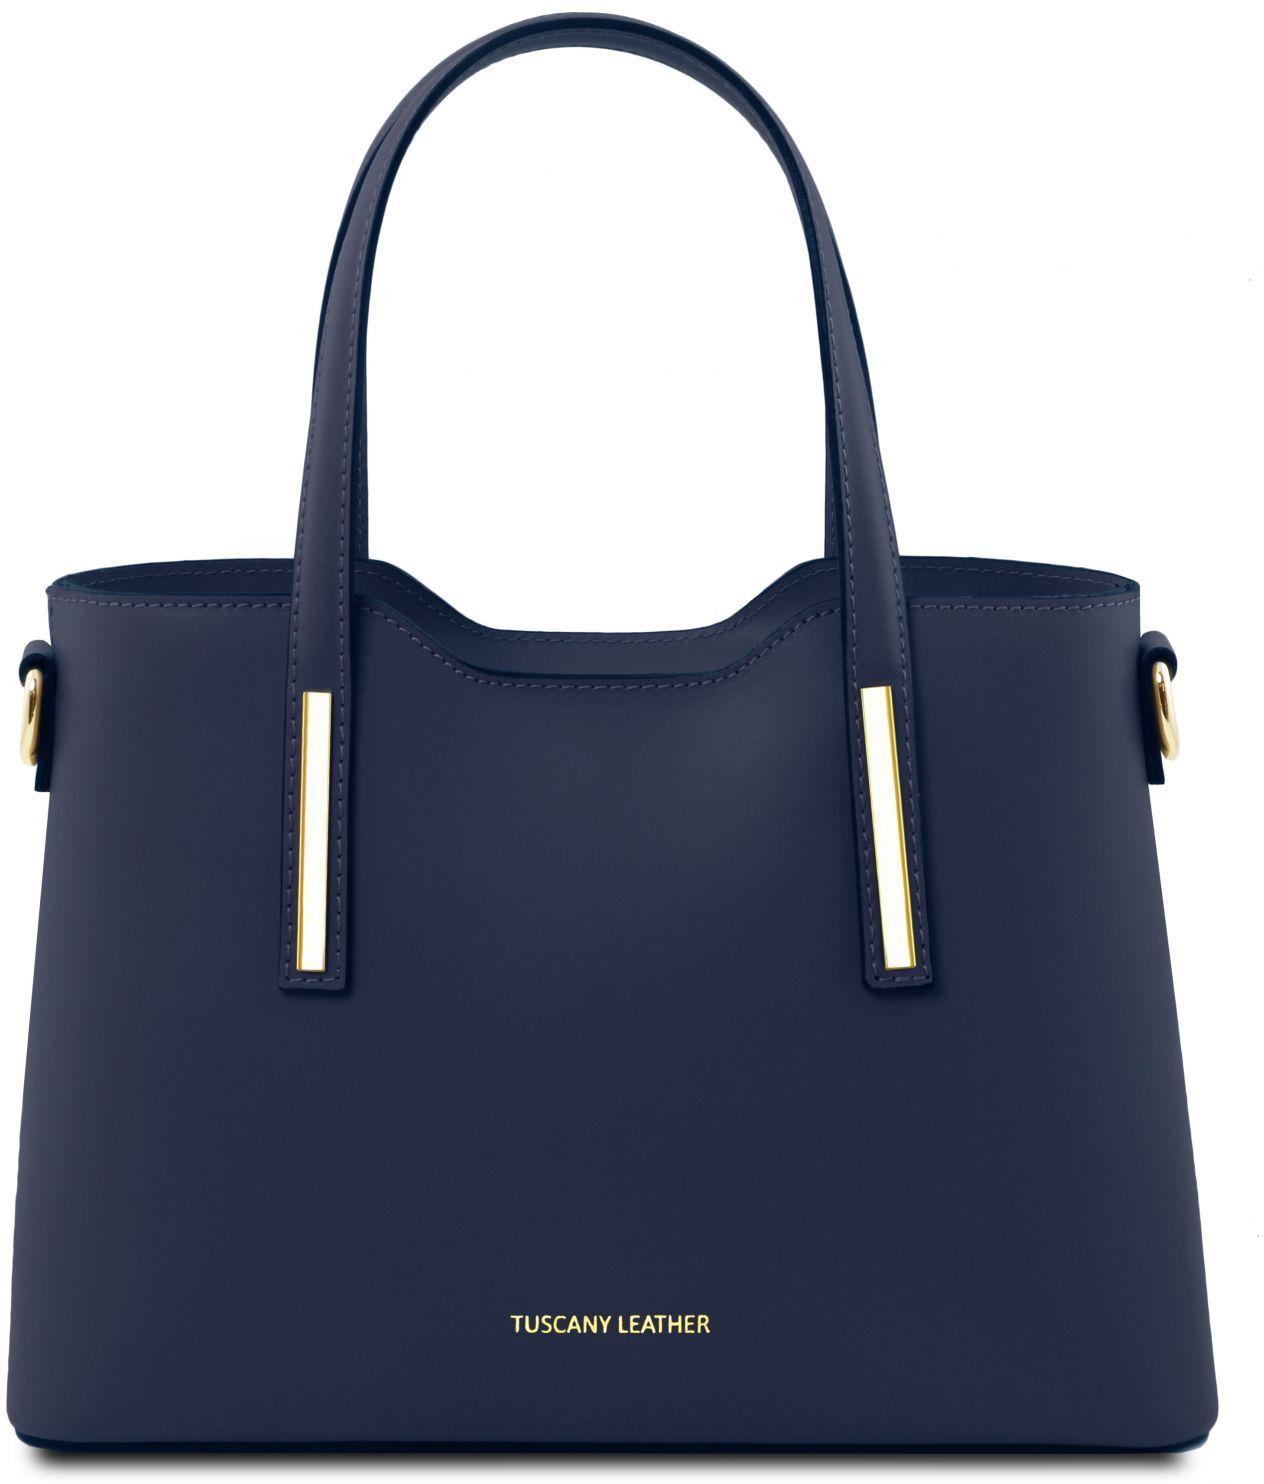 d5db2a65bc Γυναικεία Τσάντα Δερμάτινη Olimpia S Μπλε σκούρο Tuscany Leather